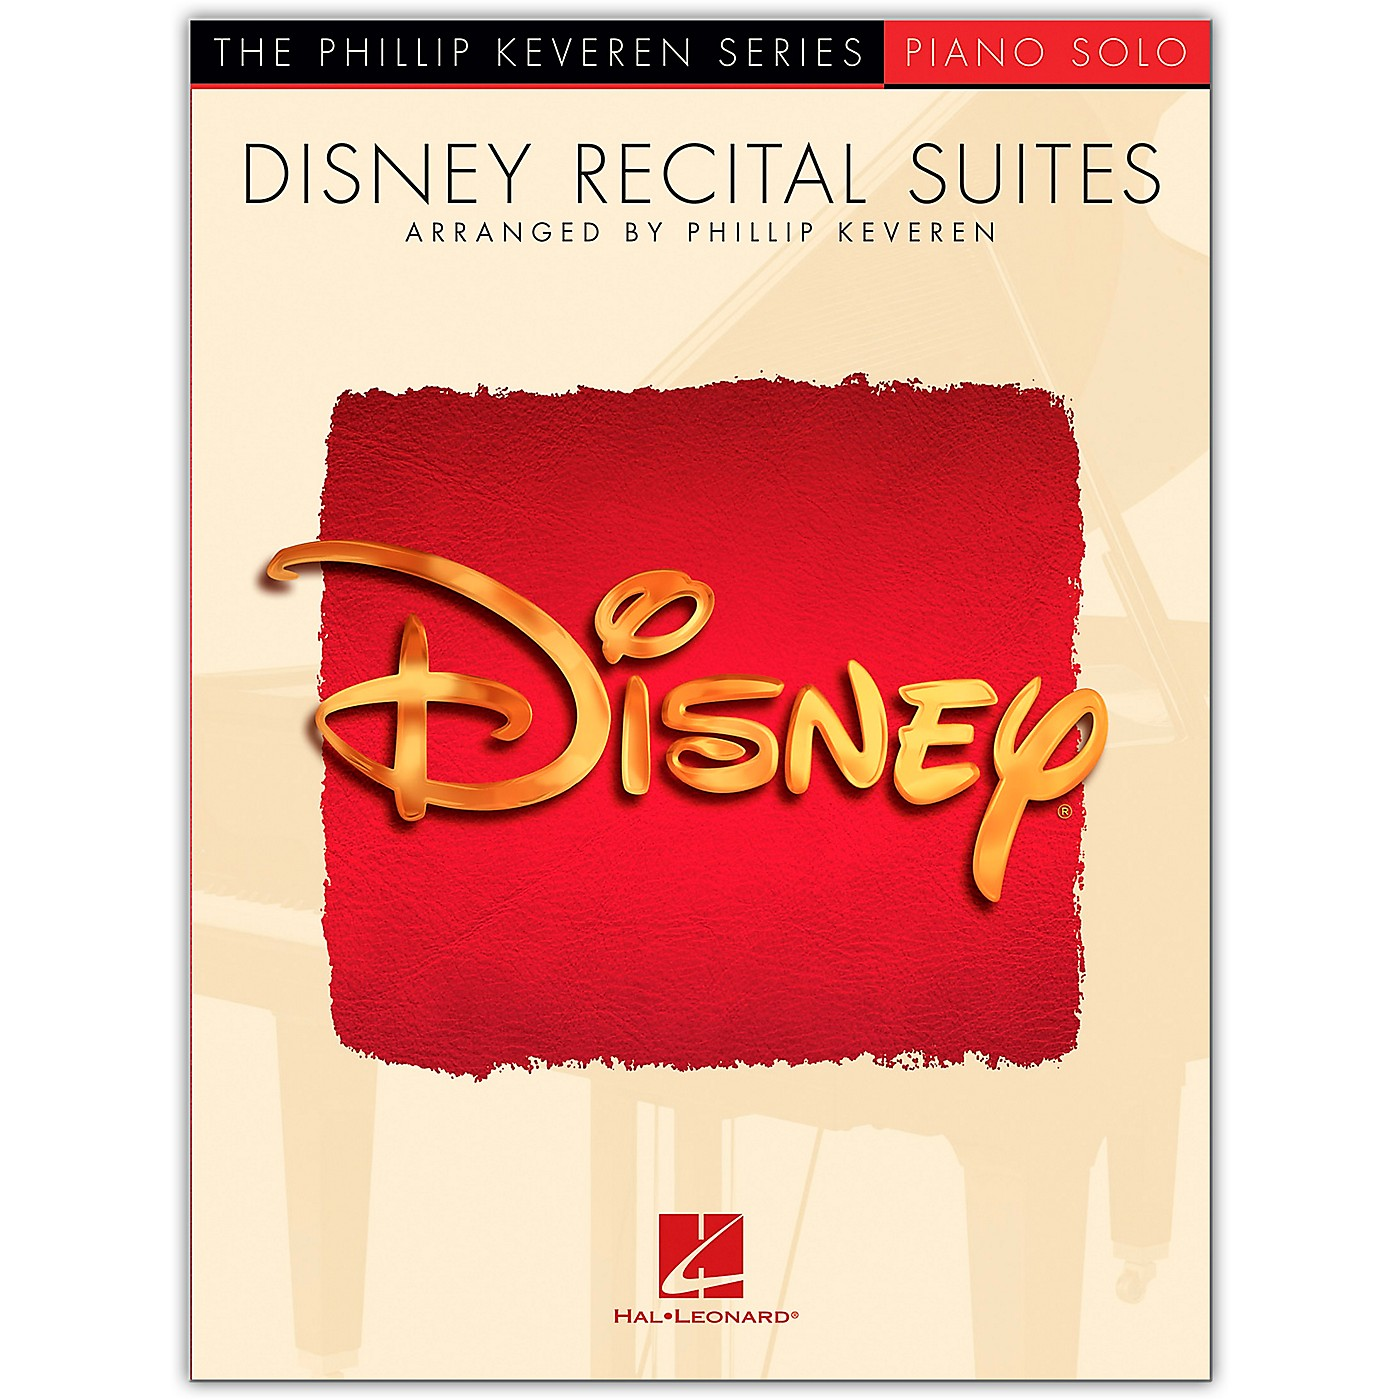 Hal Leonard Disney Recital Suites for Piano Solo (Phillip Keveren Series) thumbnail